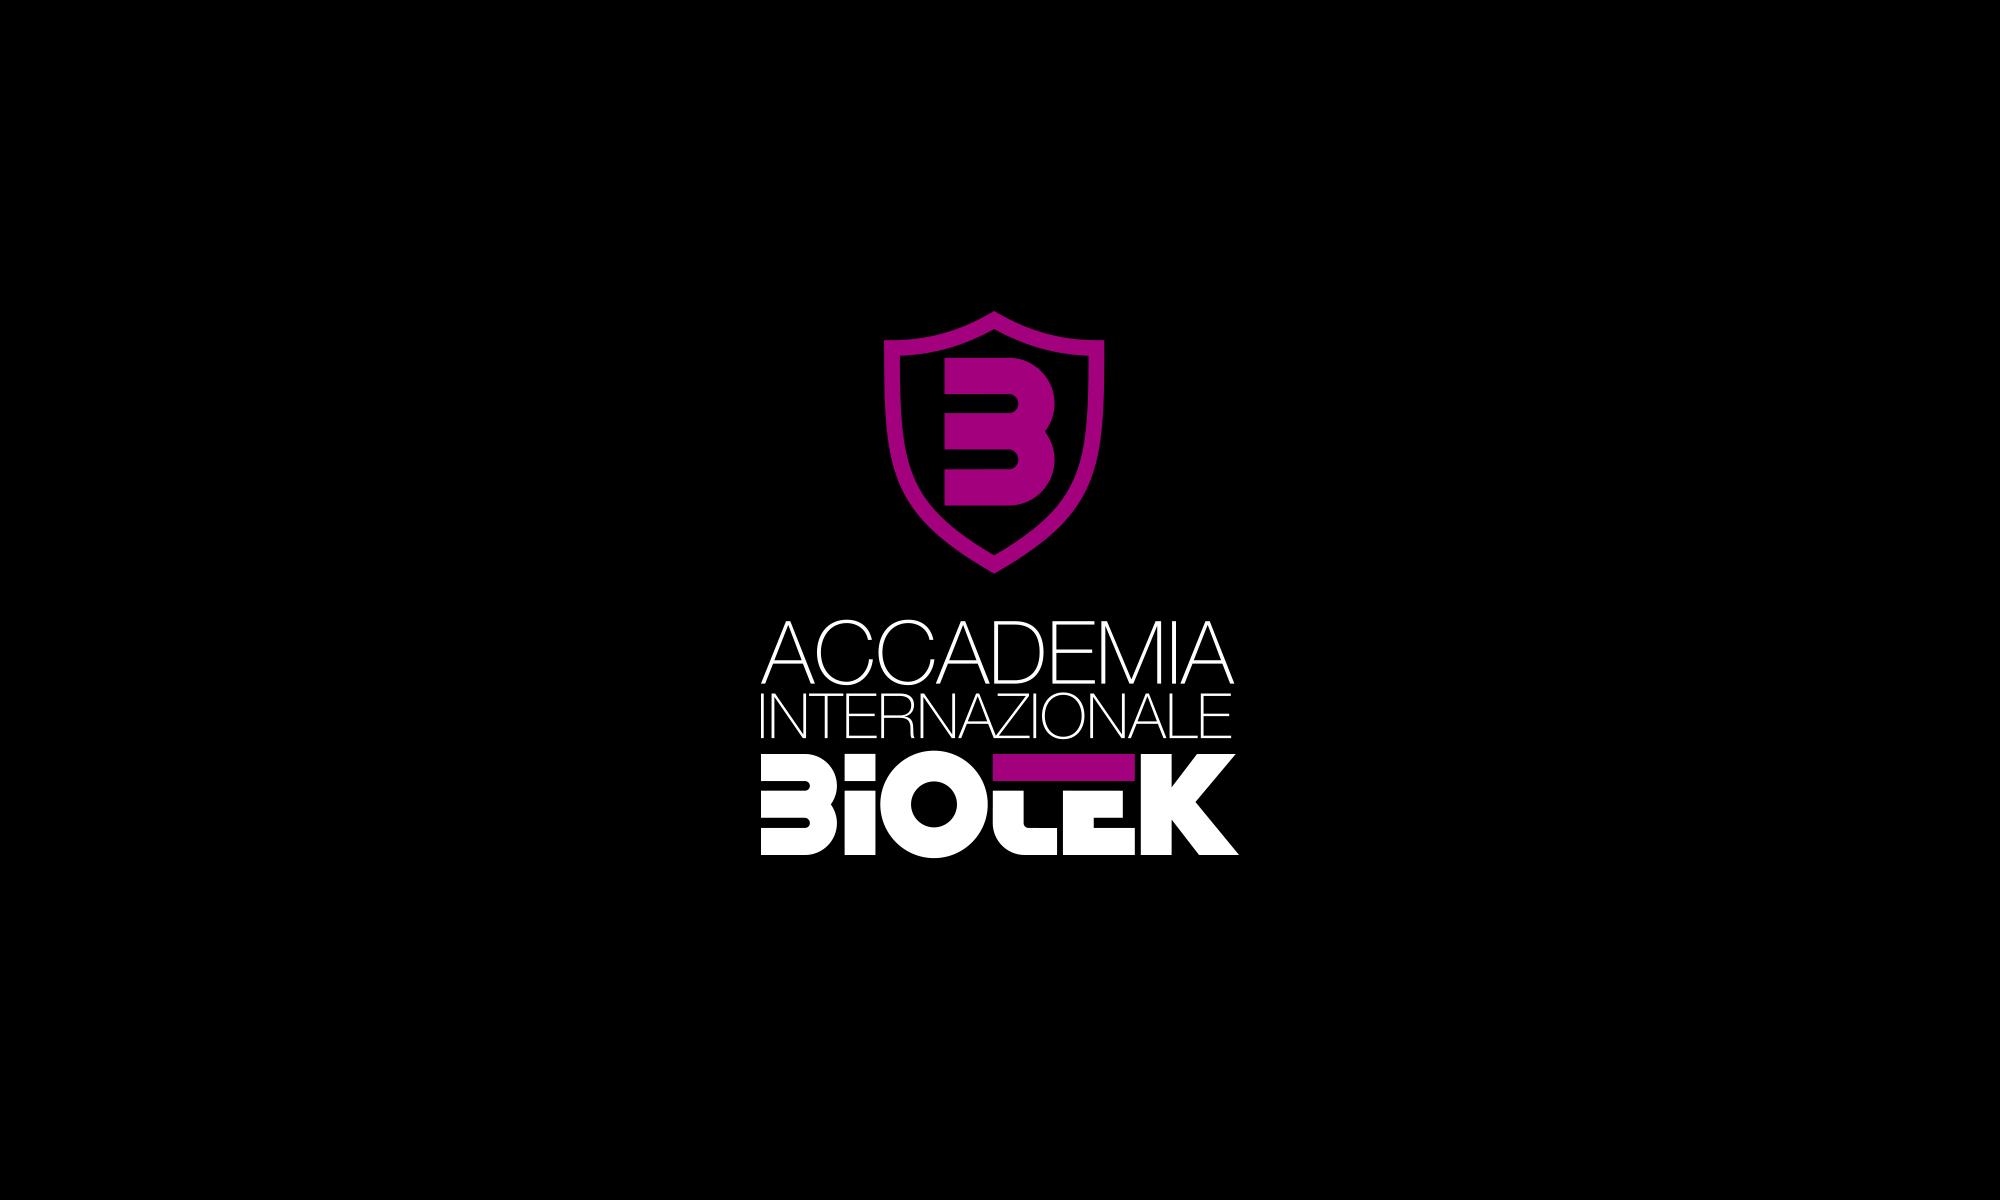 Accademia INTERNAZIONALE Biotek